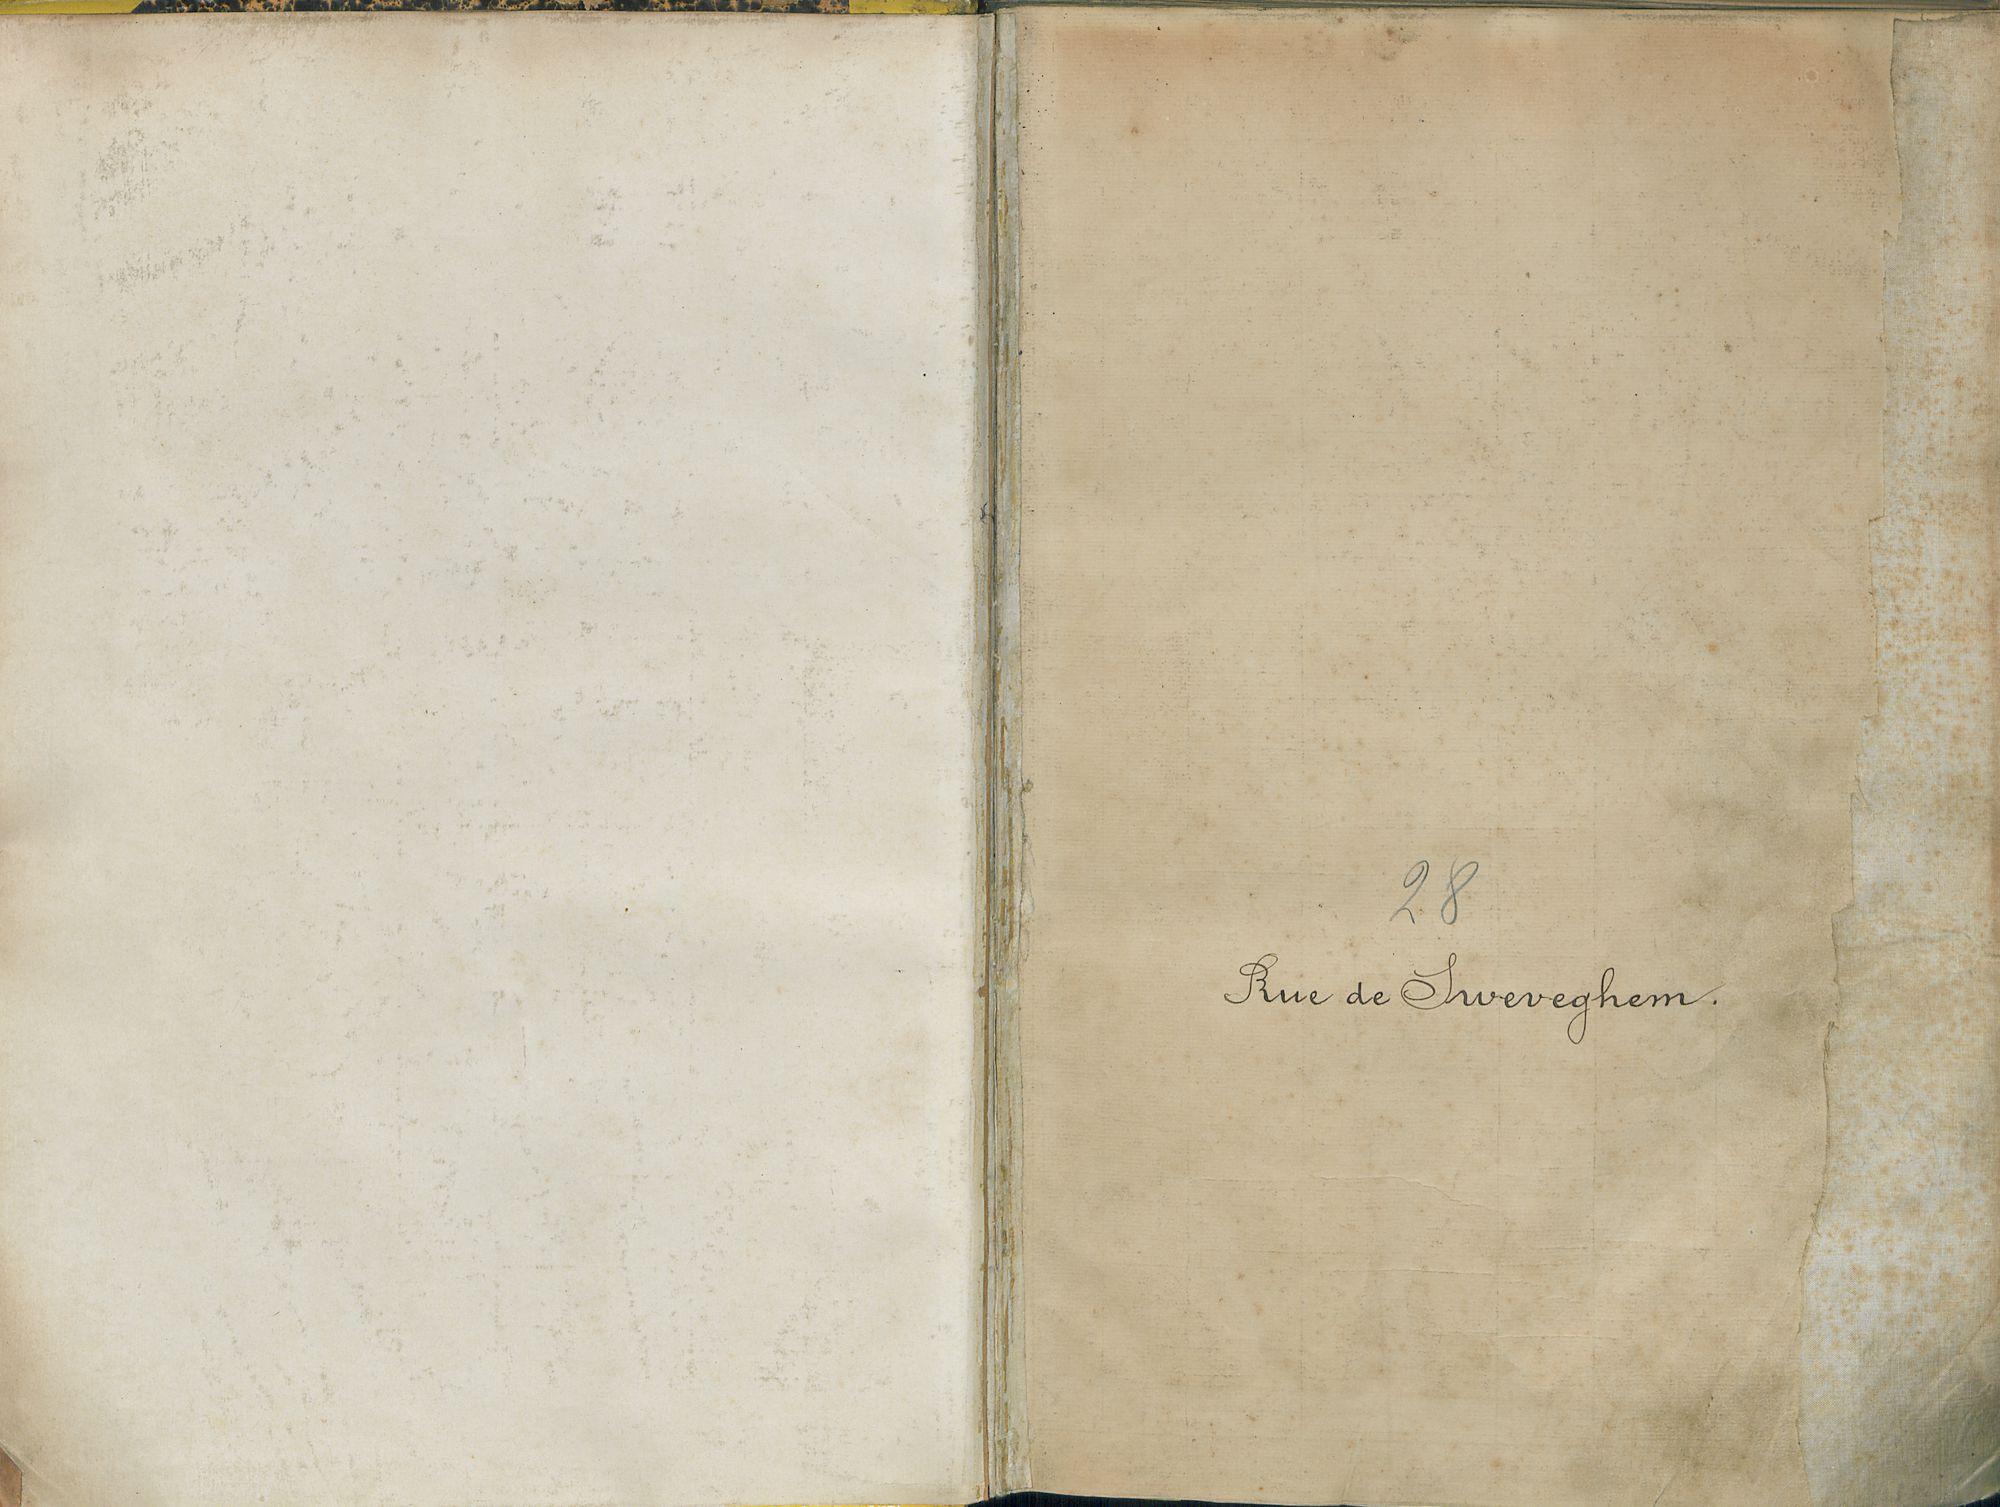 Bevolkingsregister Kortrijk 1890 boek 28